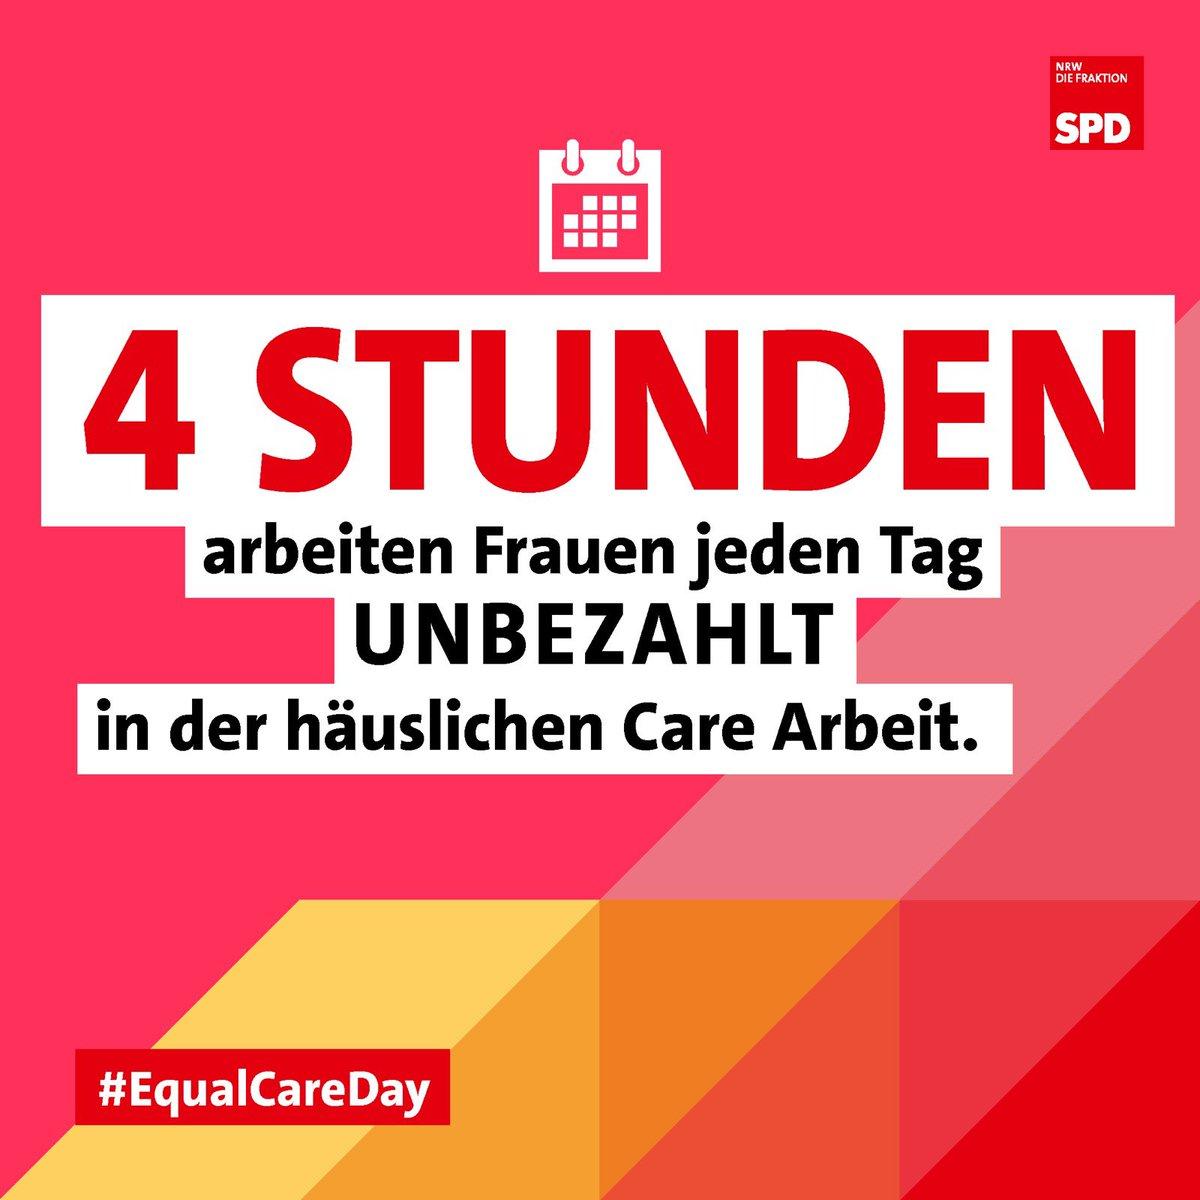 #EqualCareDay